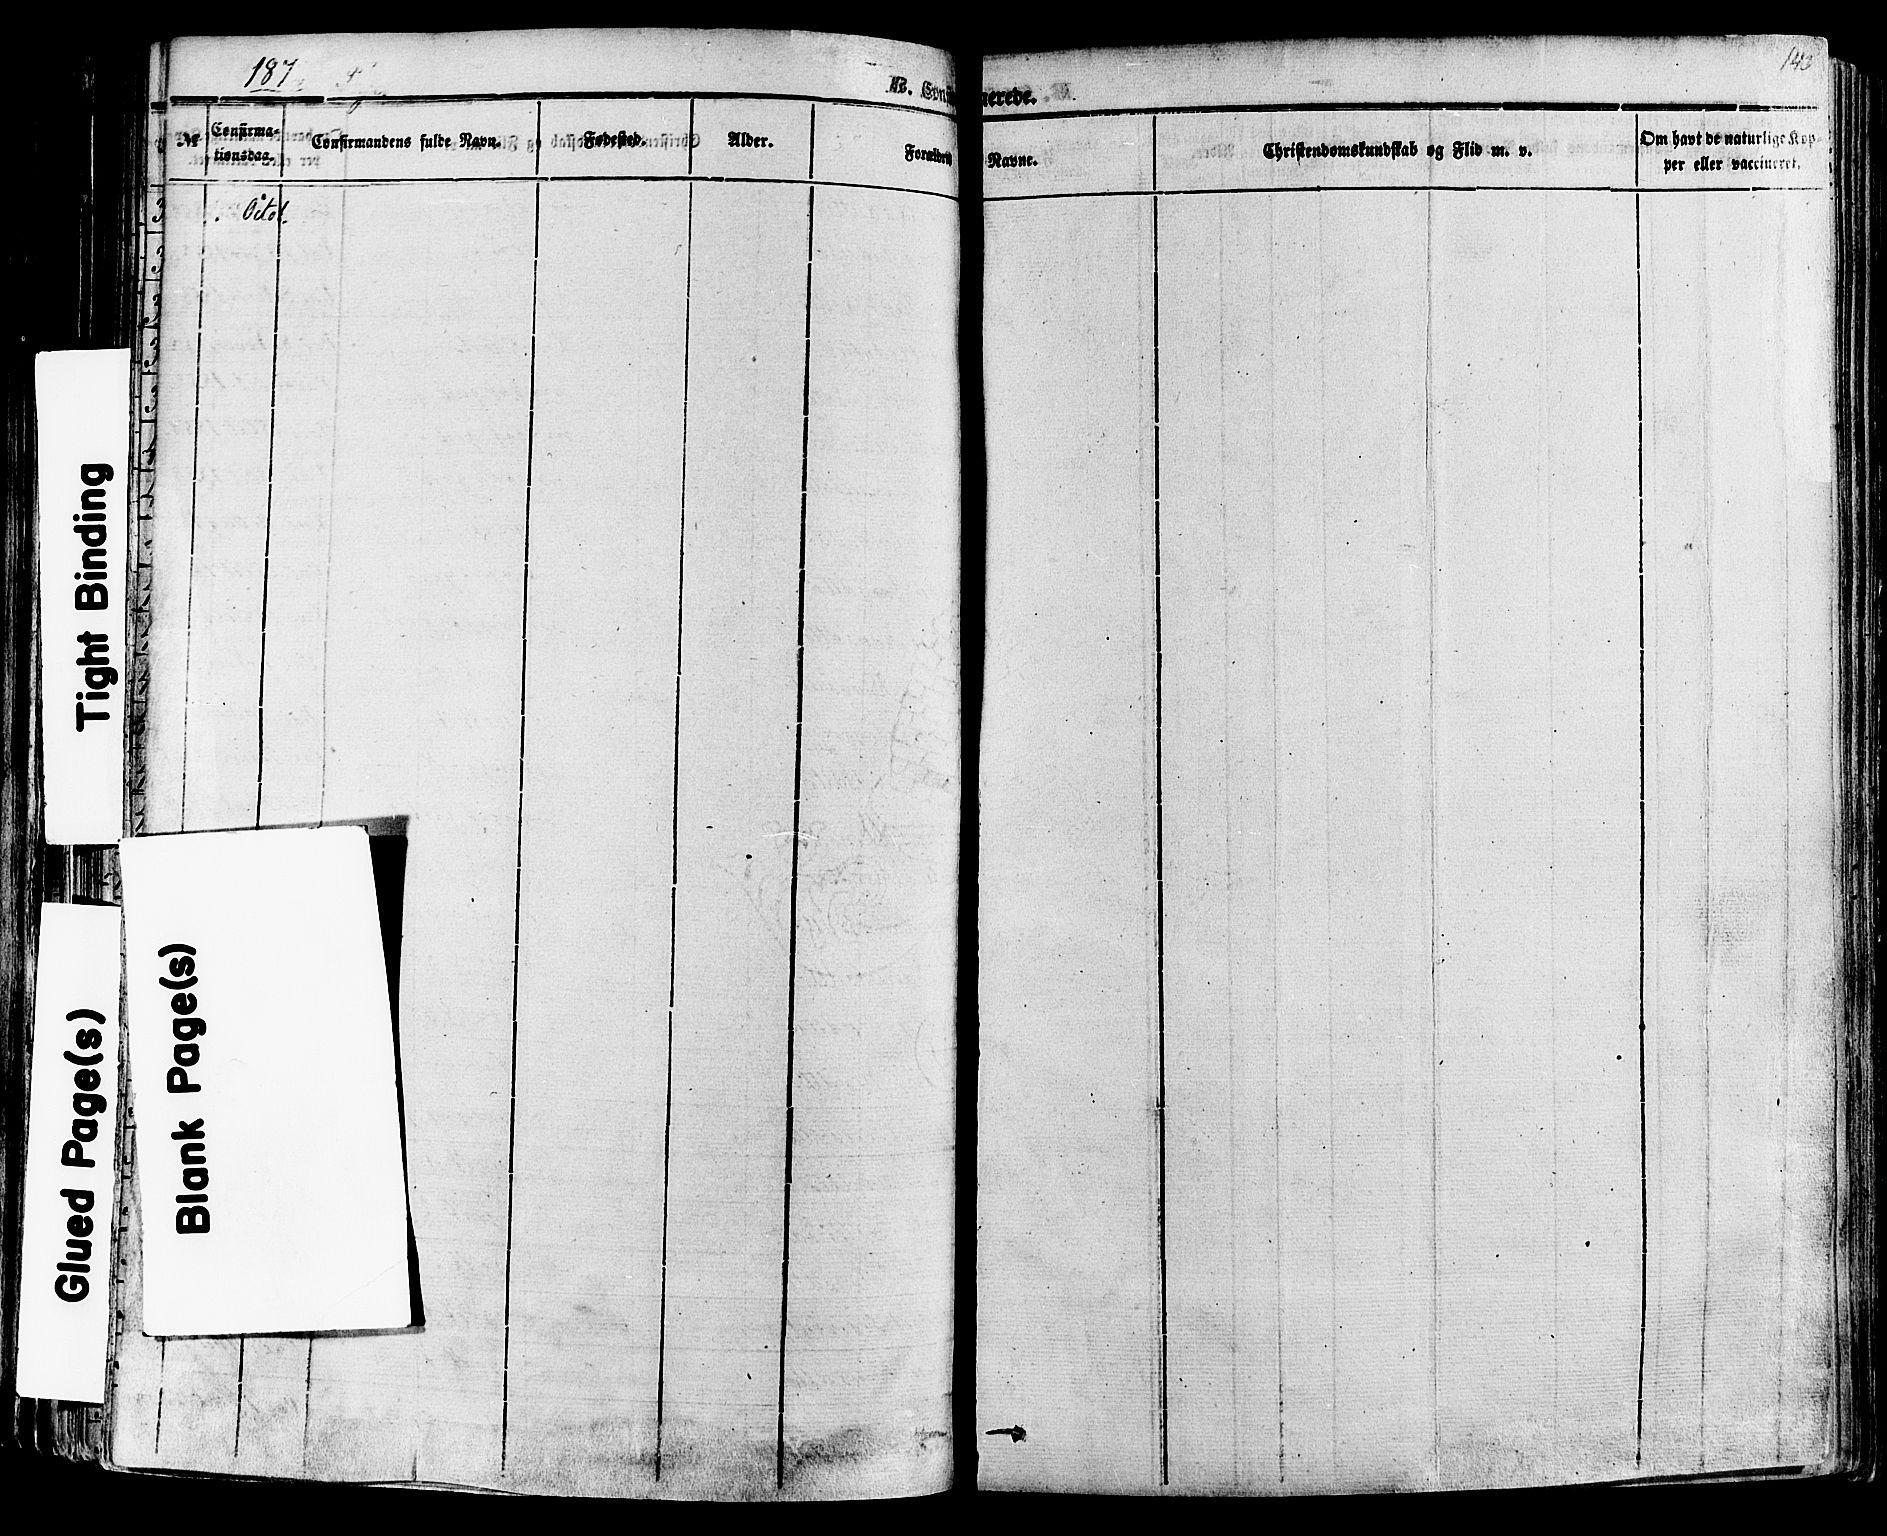 SAKO, Sauherad kirkebøker, F/Fa/L0007: Ministerialbok nr. I 7, 1851-1873, s. 140